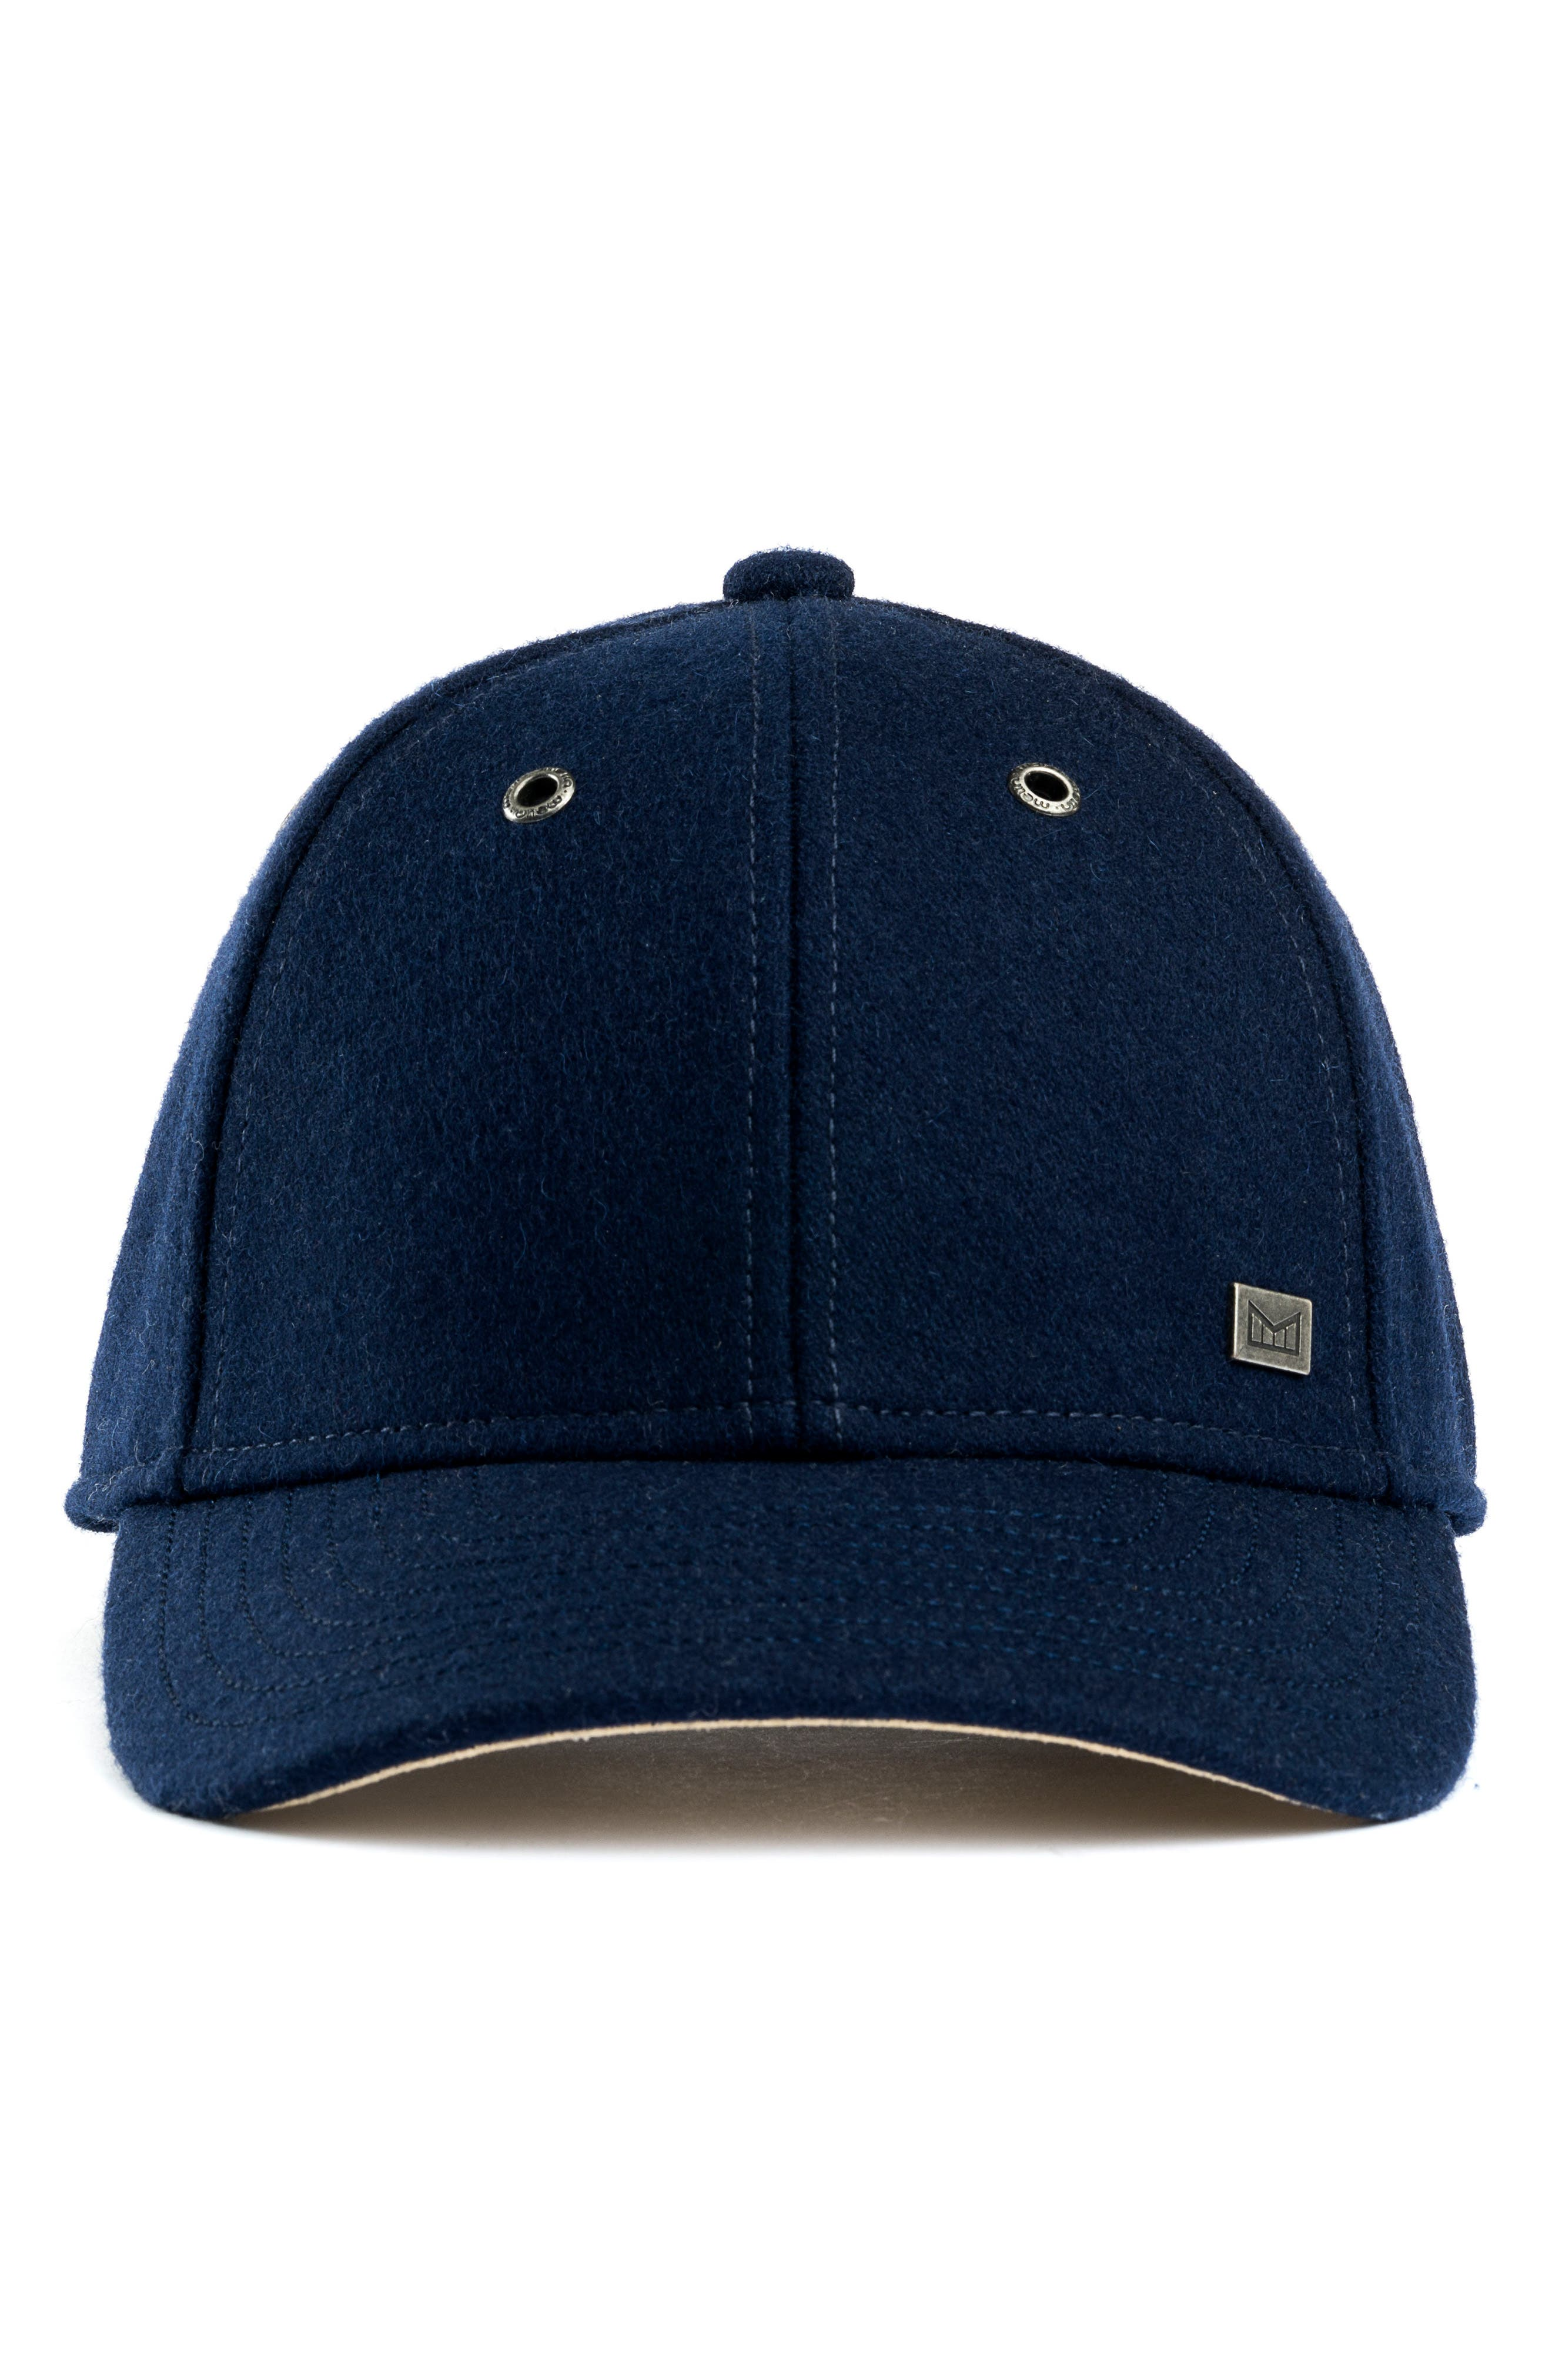 Midnight Baseball Cap,                             Alternate thumbnail 2, color,                             NAVY